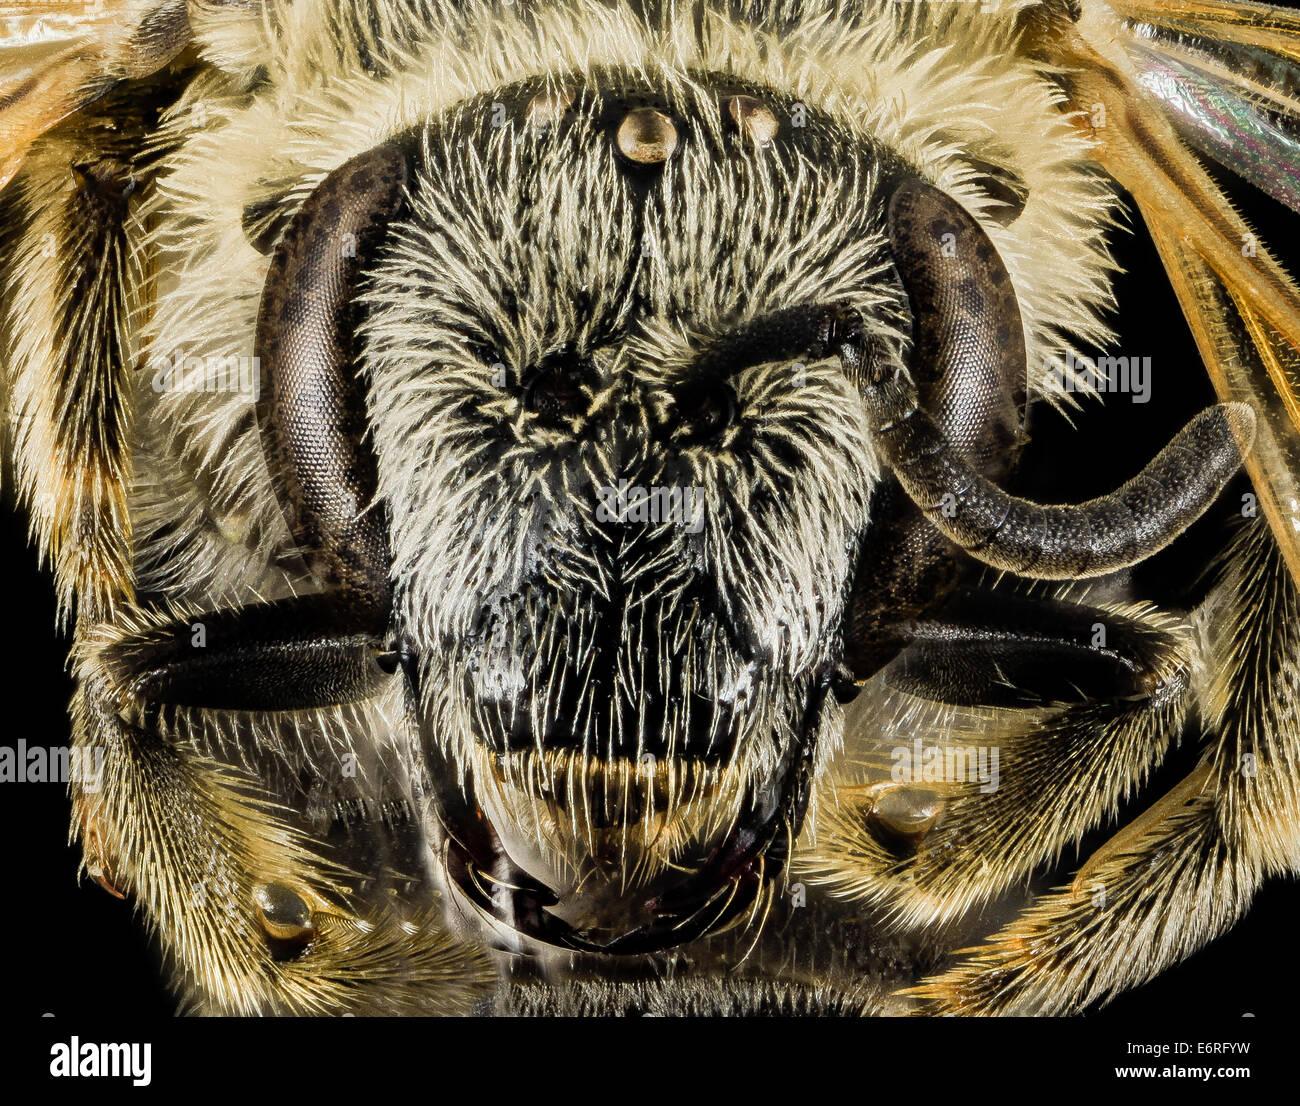 Lasioglossum paraforbesii, F, face, Pennington Co, S Dakota_2014-01-10-154401 ZS PMax_12279007735_o Another bee - Stock Image